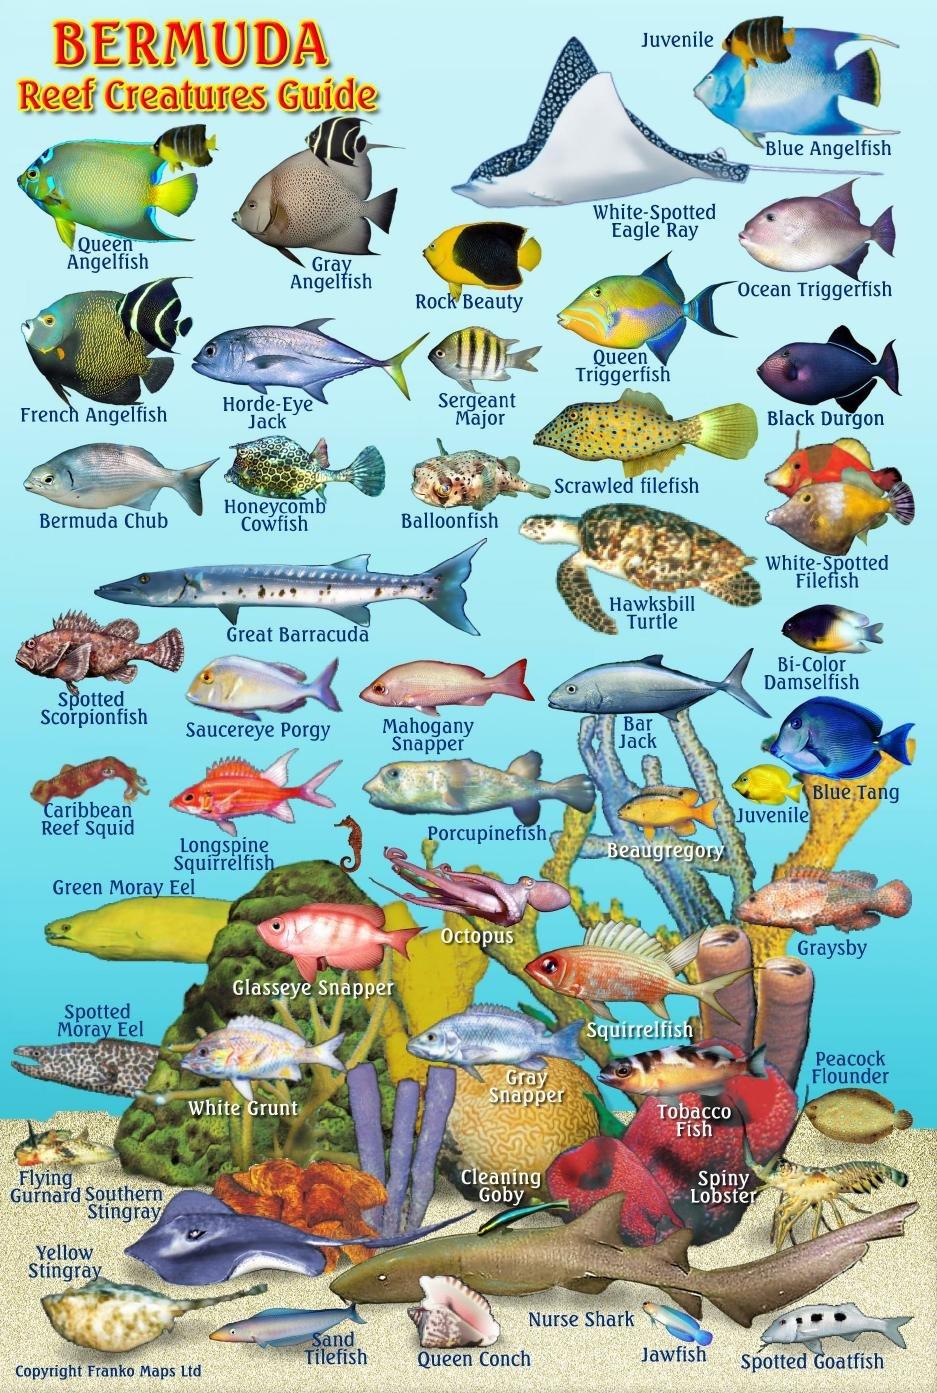 100 puerto rico u2013 laura hooper fort lauderdale for Fishing in bermuda